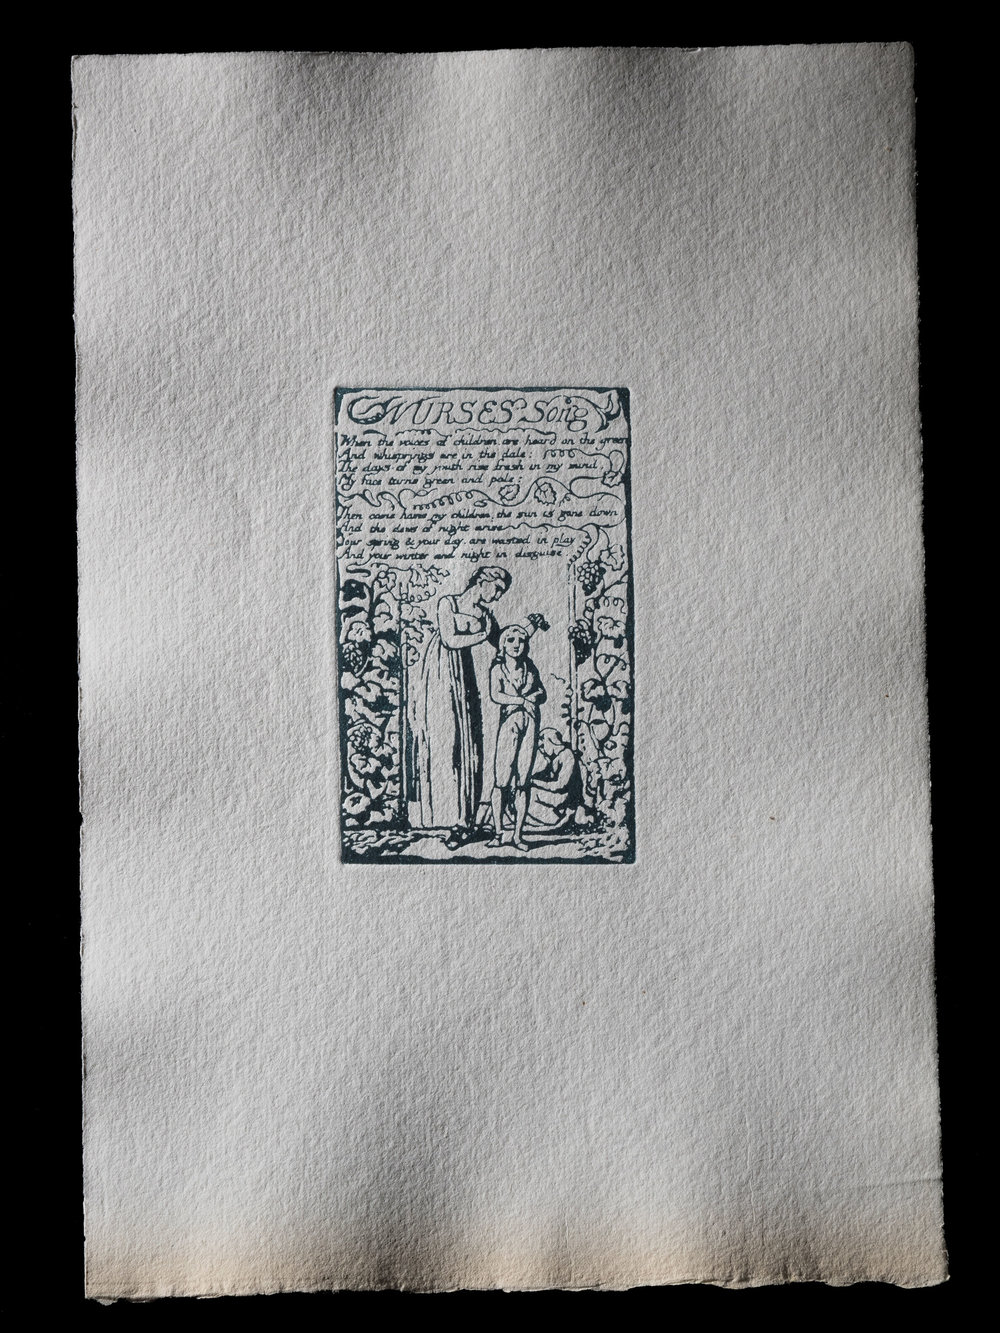 Nurses Song, 114 x 70 mm